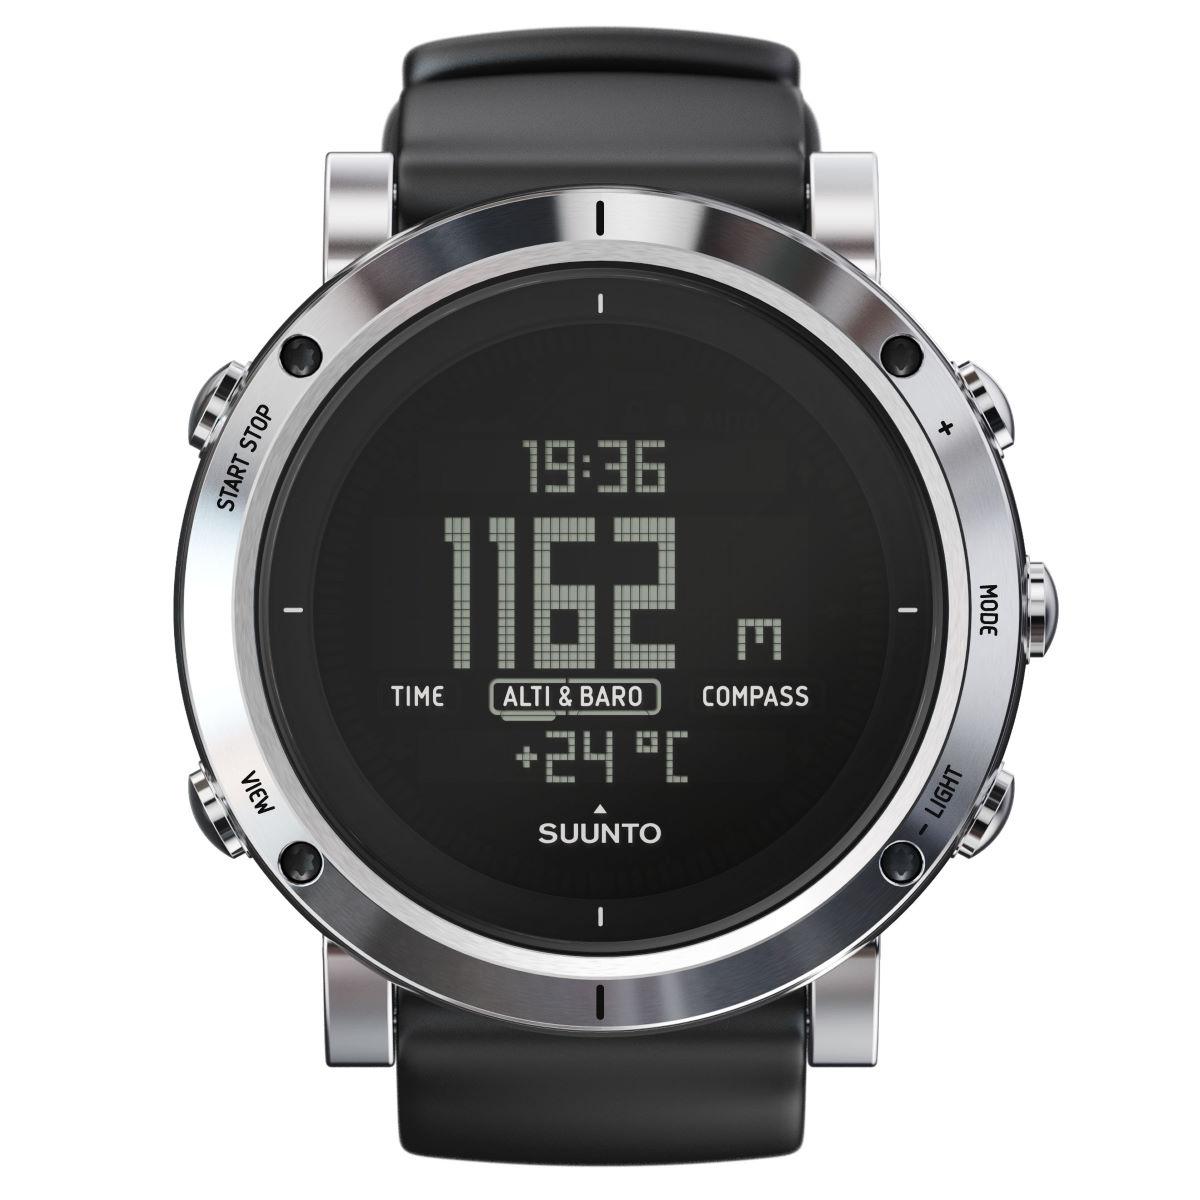 Reloj deportivo Suunto Core (acero pulido) - Relojes deportivos